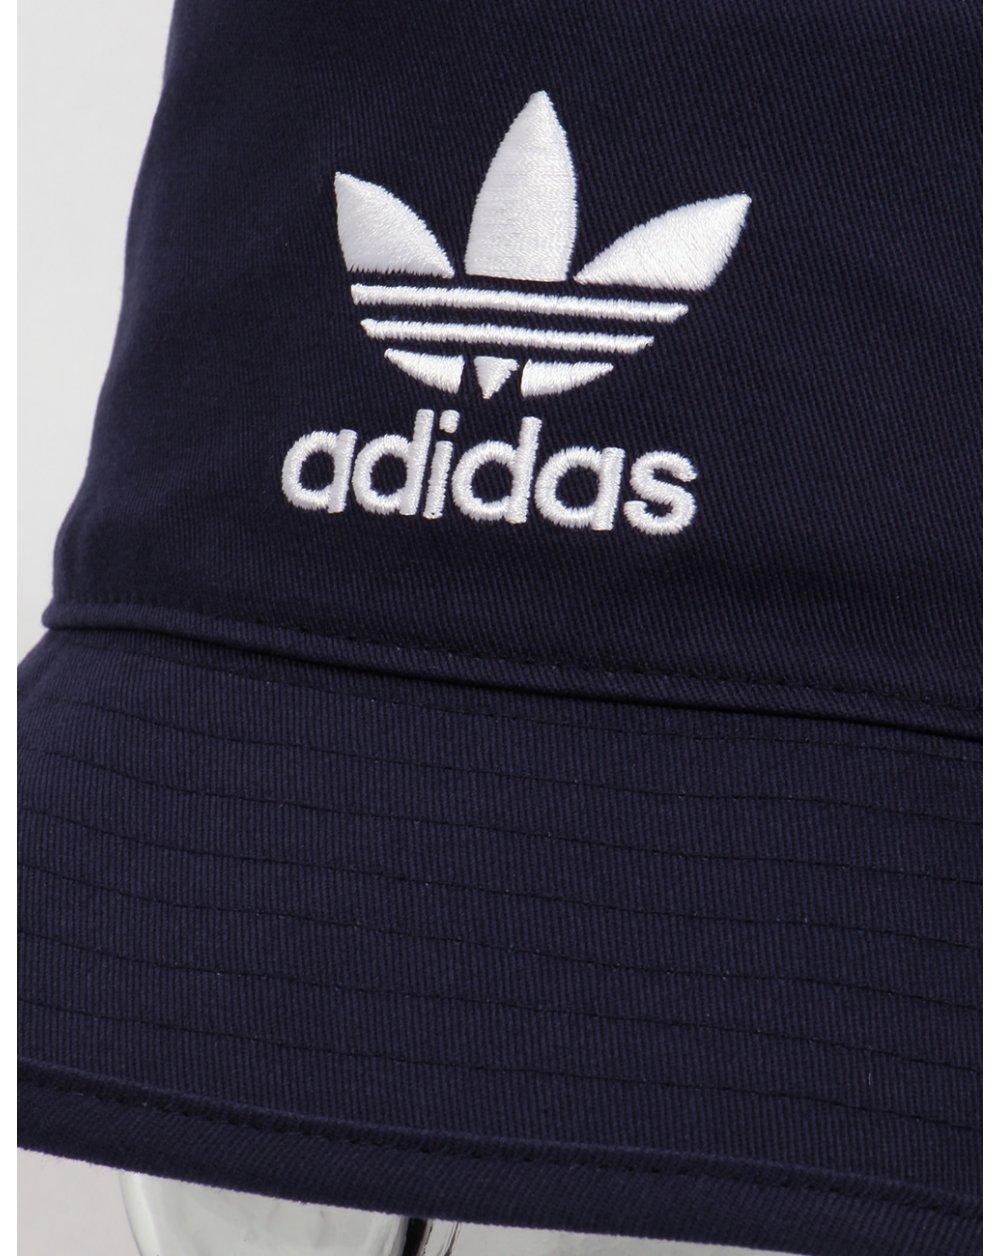 3798a375b7a Adidas Originals Bucket Hat With Trefoil Navy